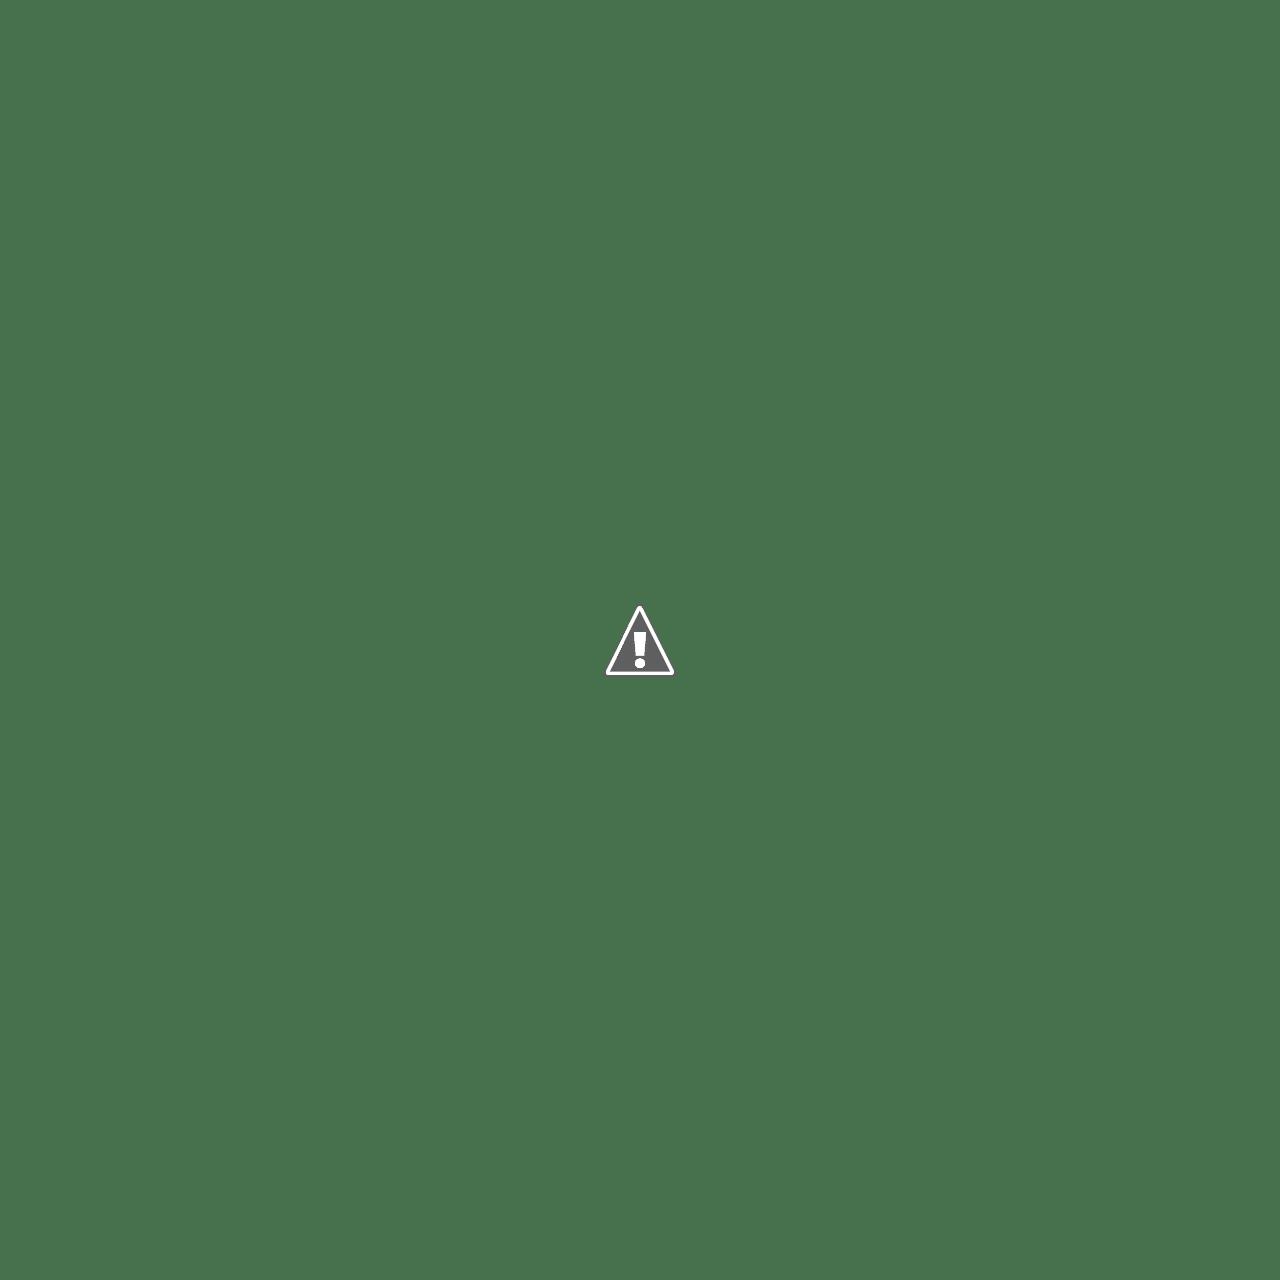 Manisha Design House Vadodara Vapi Architecture Interior Fashion Designing Institute In Vadodara Gujarat India